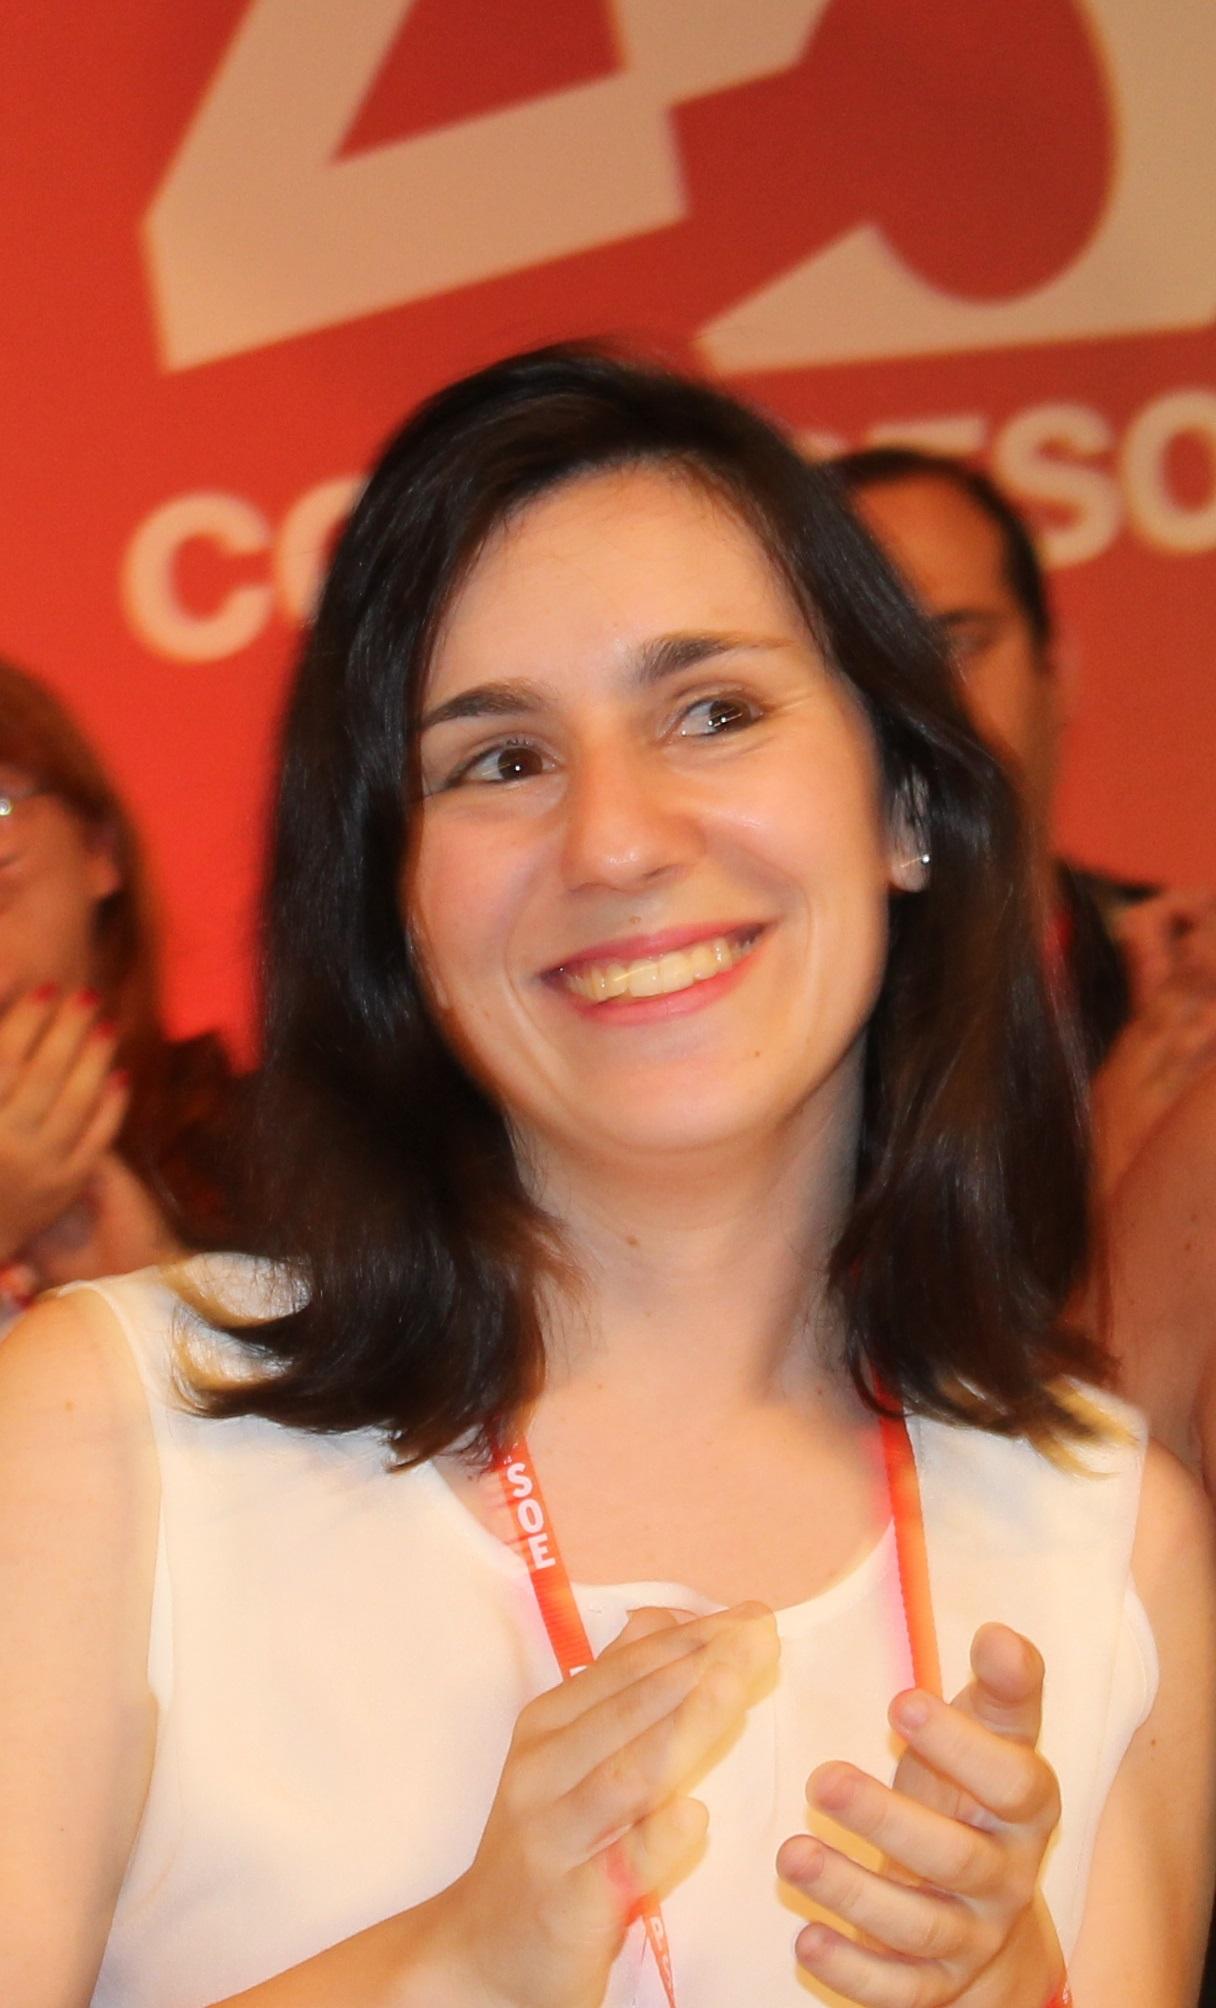 María Vallina